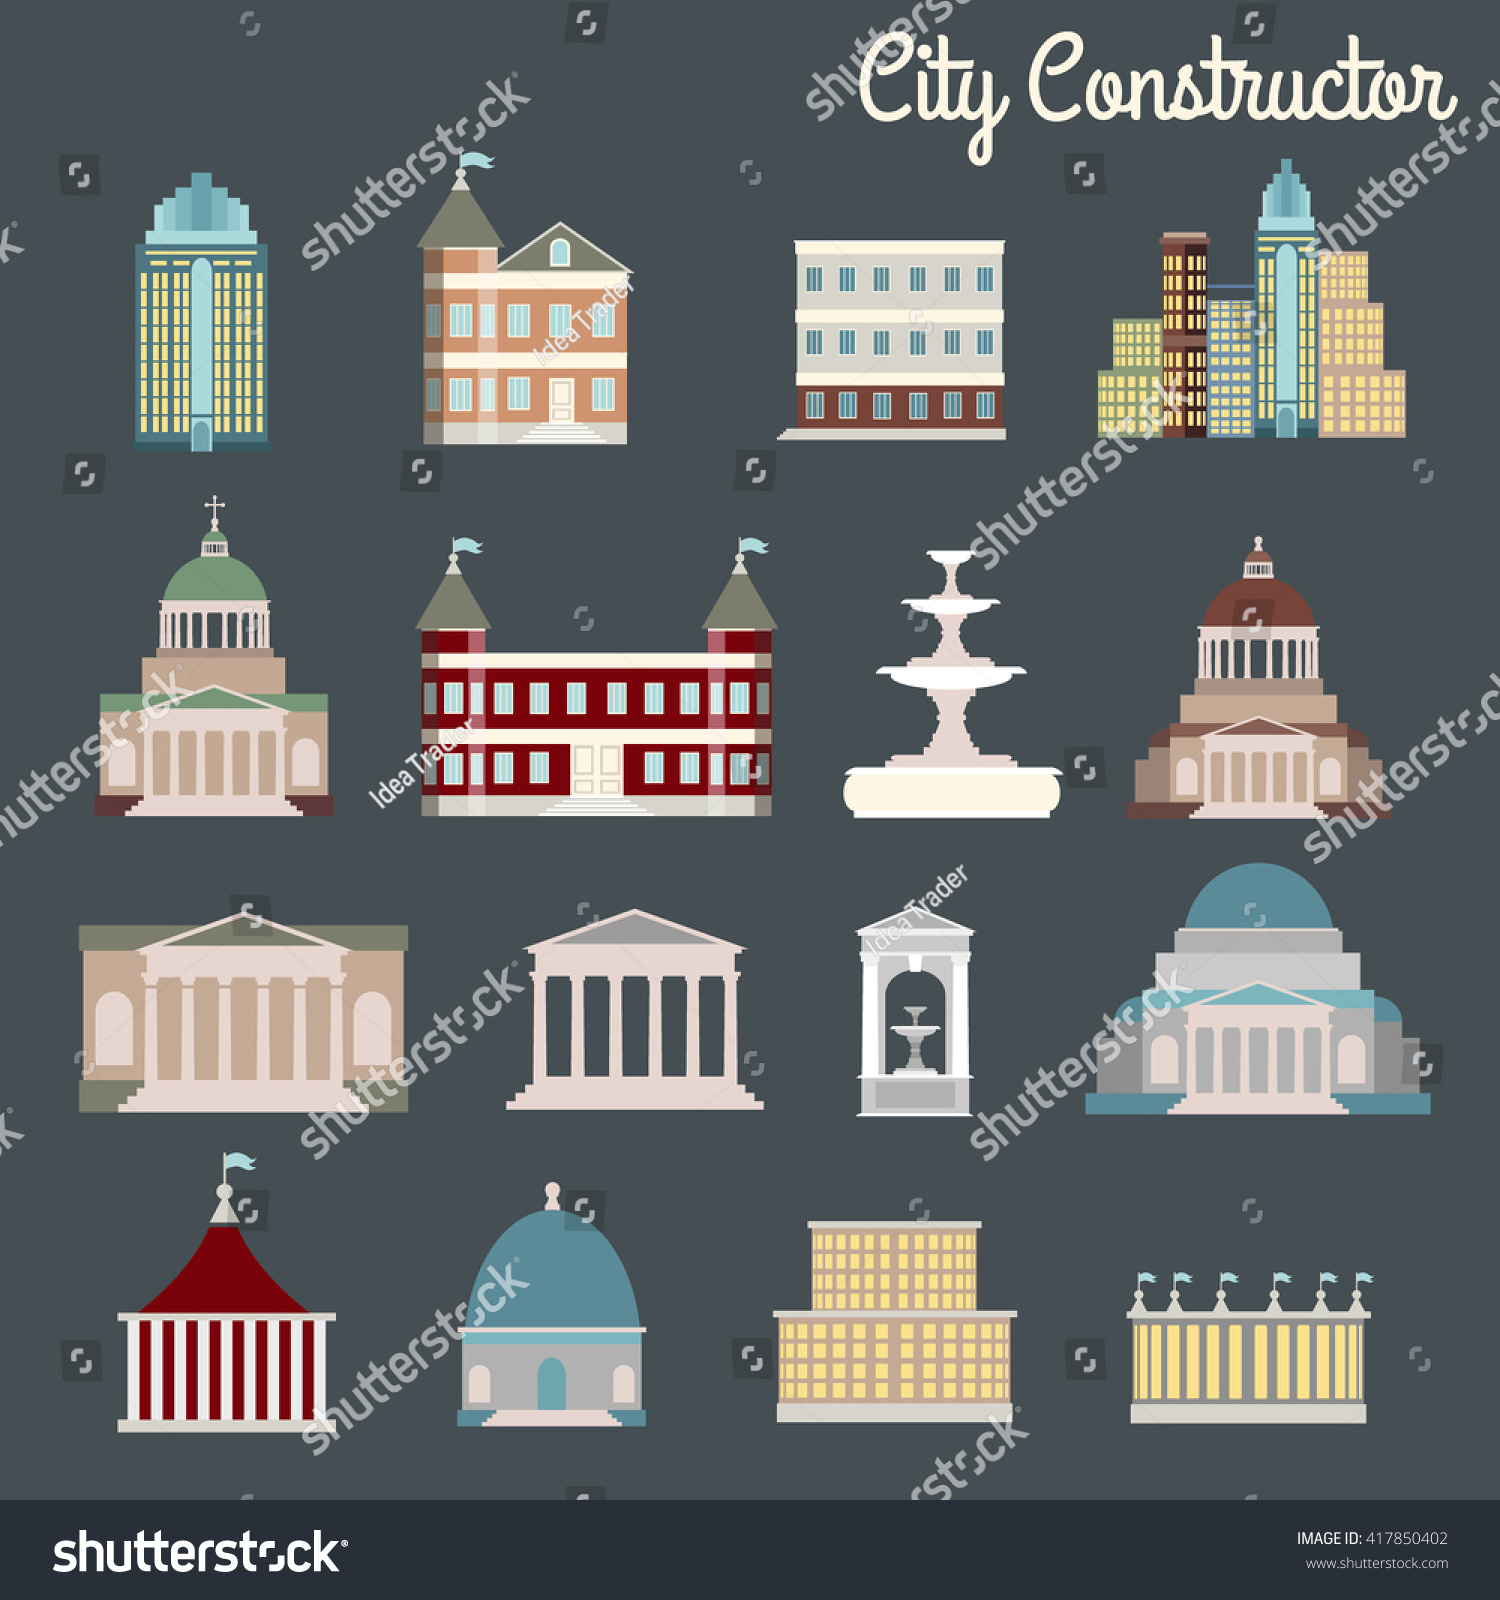 City Constructor Vector Illustration Buildings Made Cartoon Stock ...